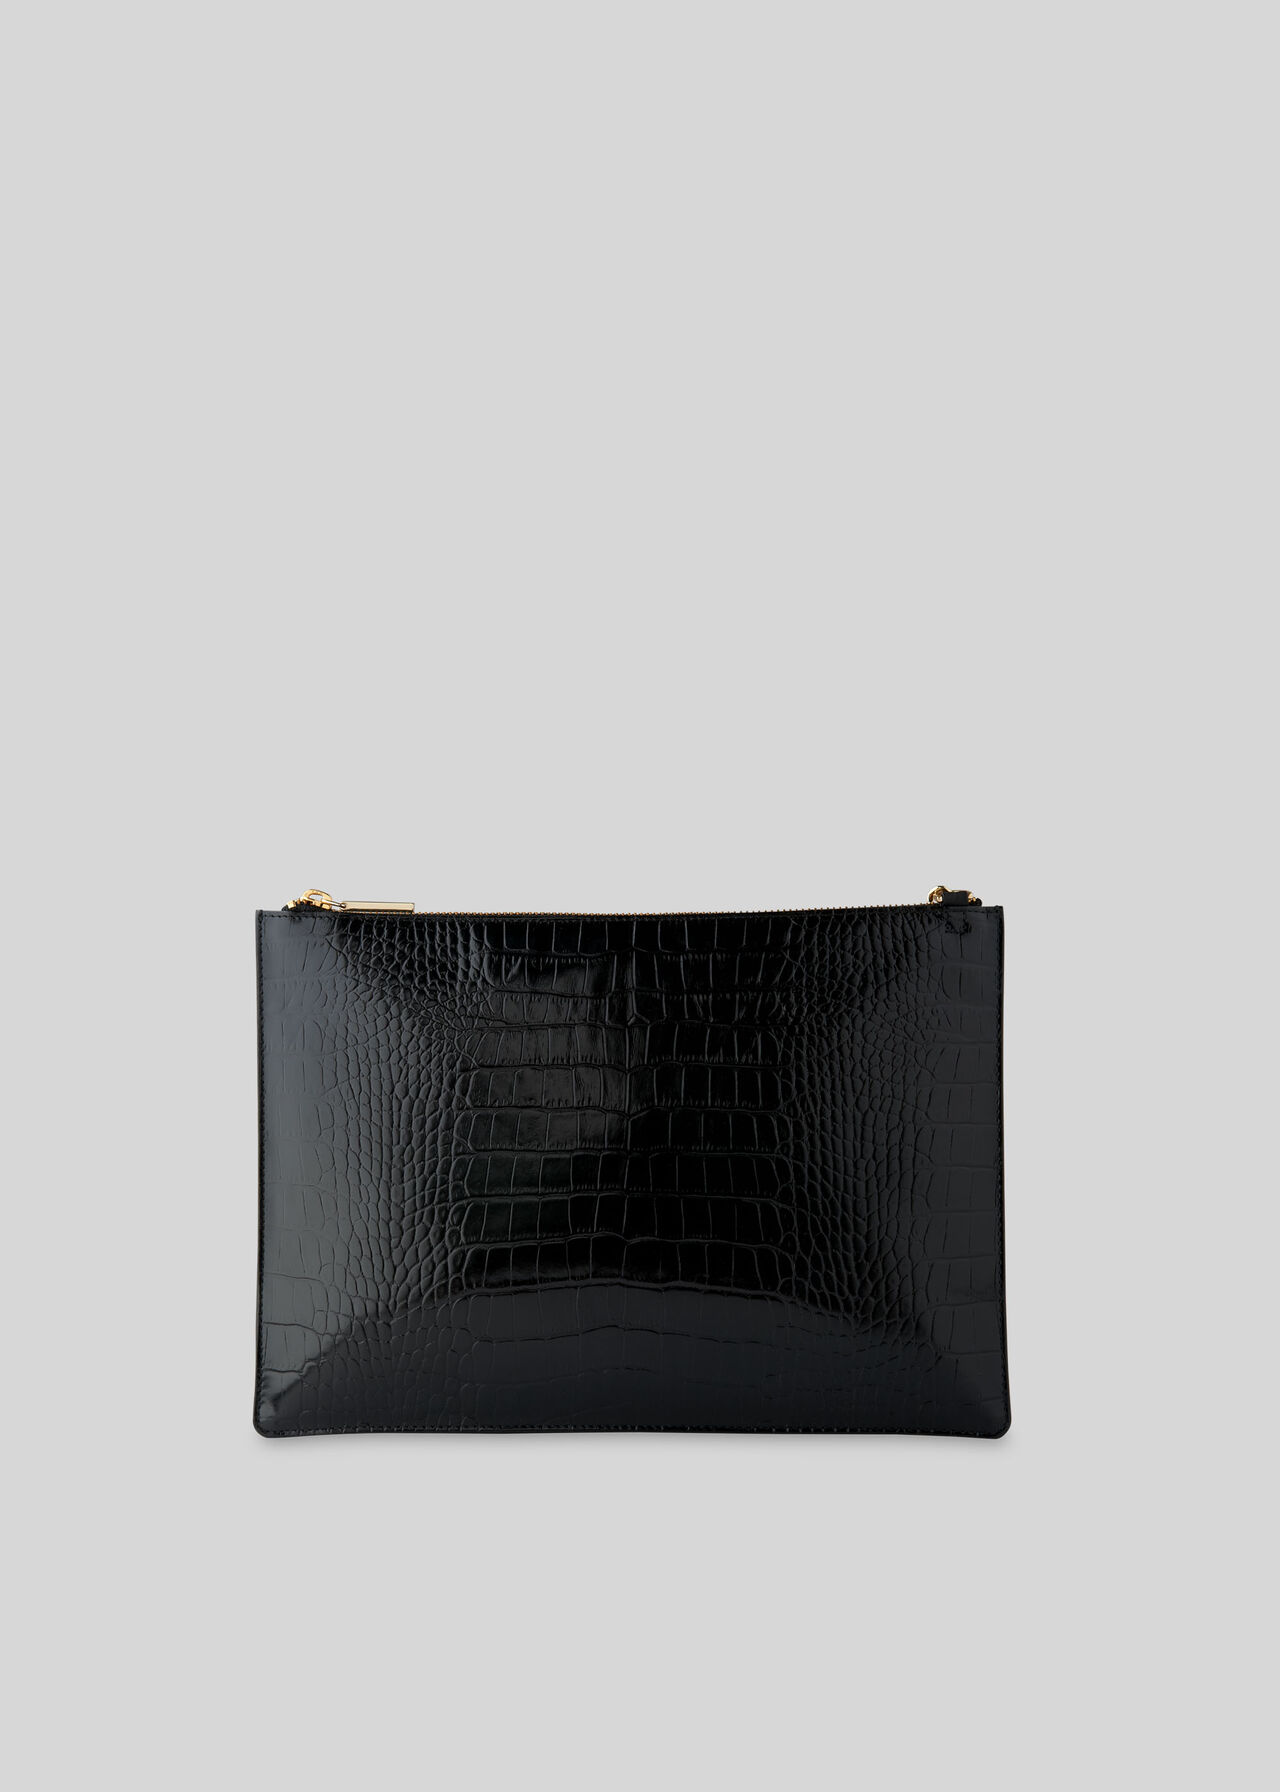 Shiny Croc Rivington Clutch Black